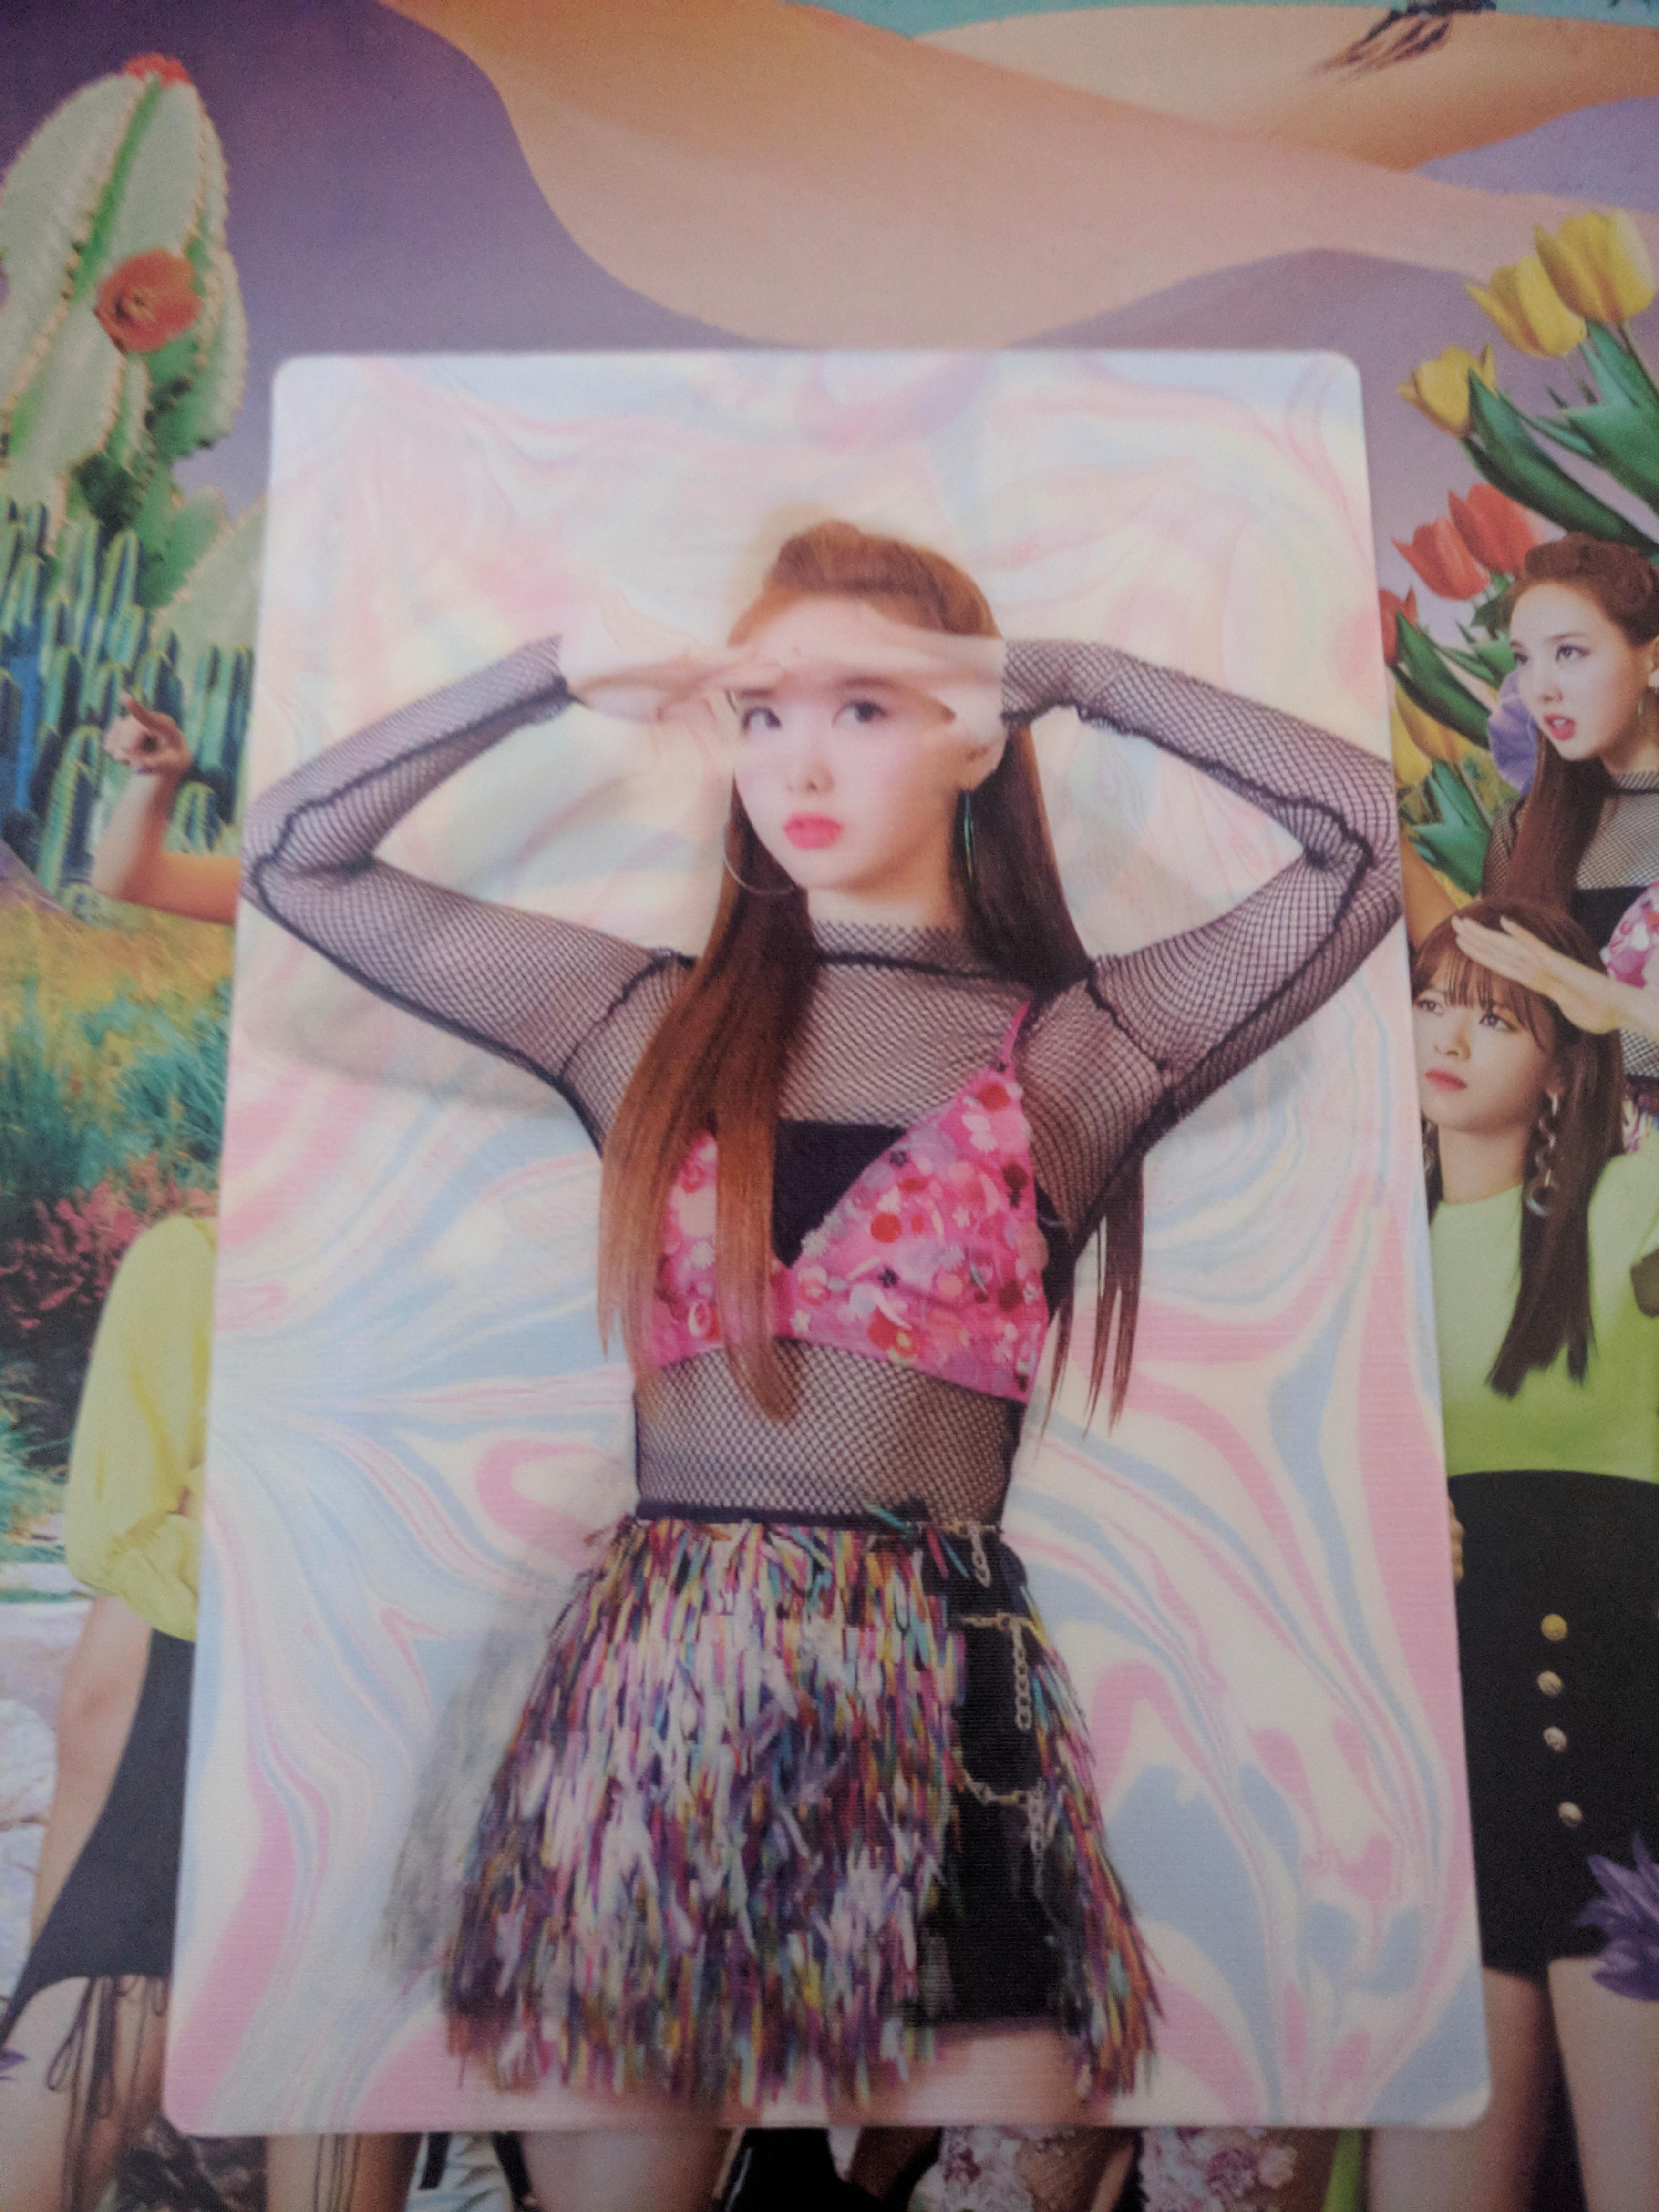 WTT]Twice Fancy You lenticular, Entertainment, K-Wave on